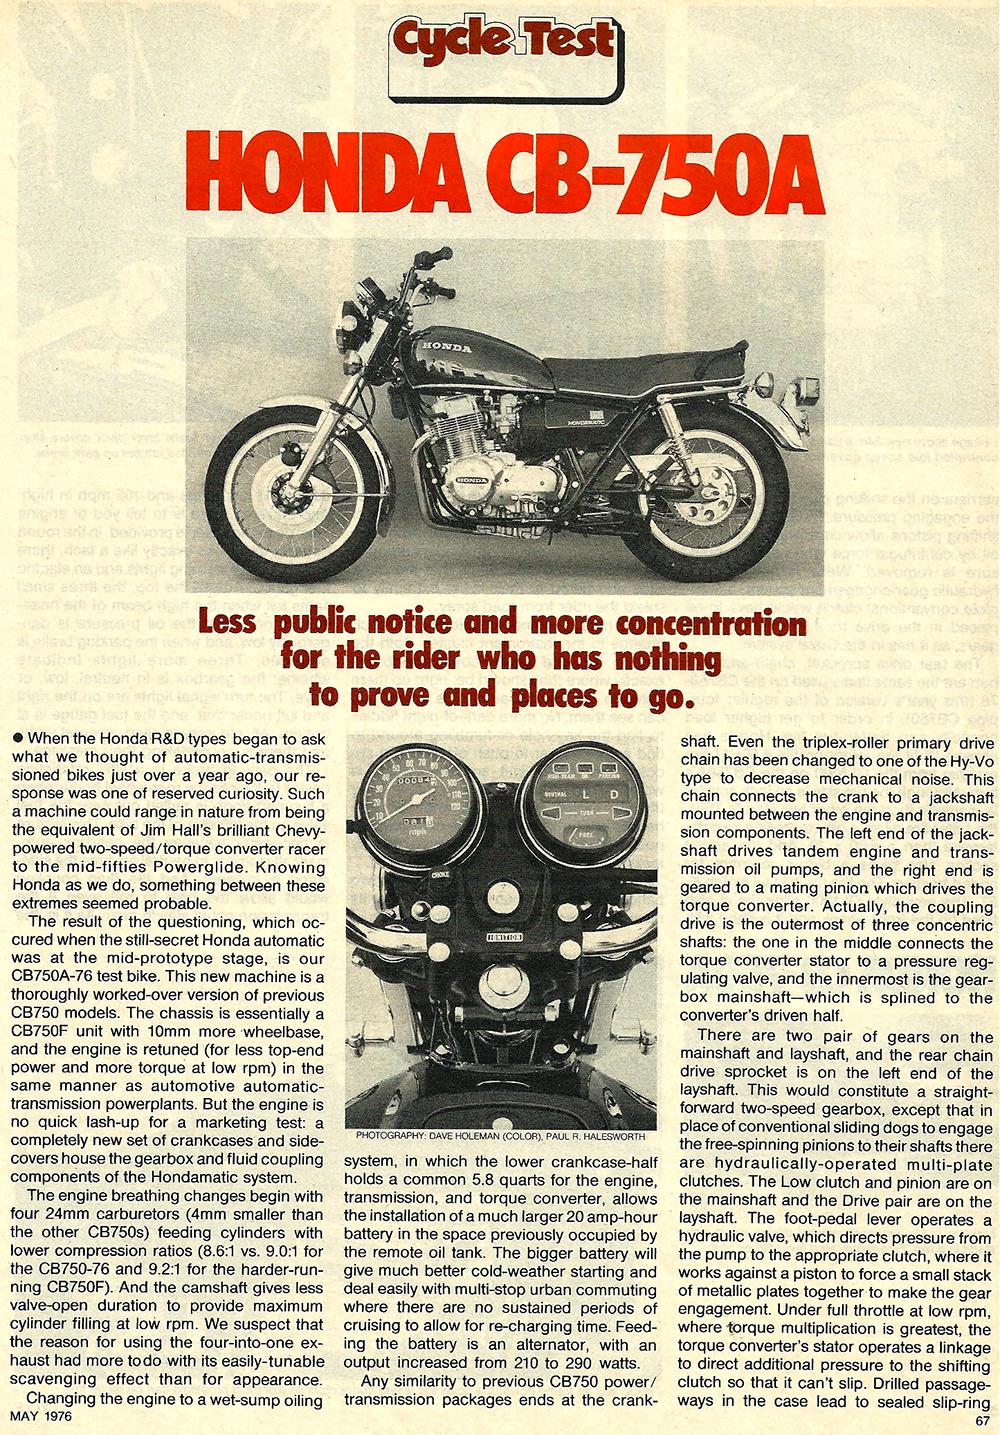 1976 Honda CB750A road test 2.JPG